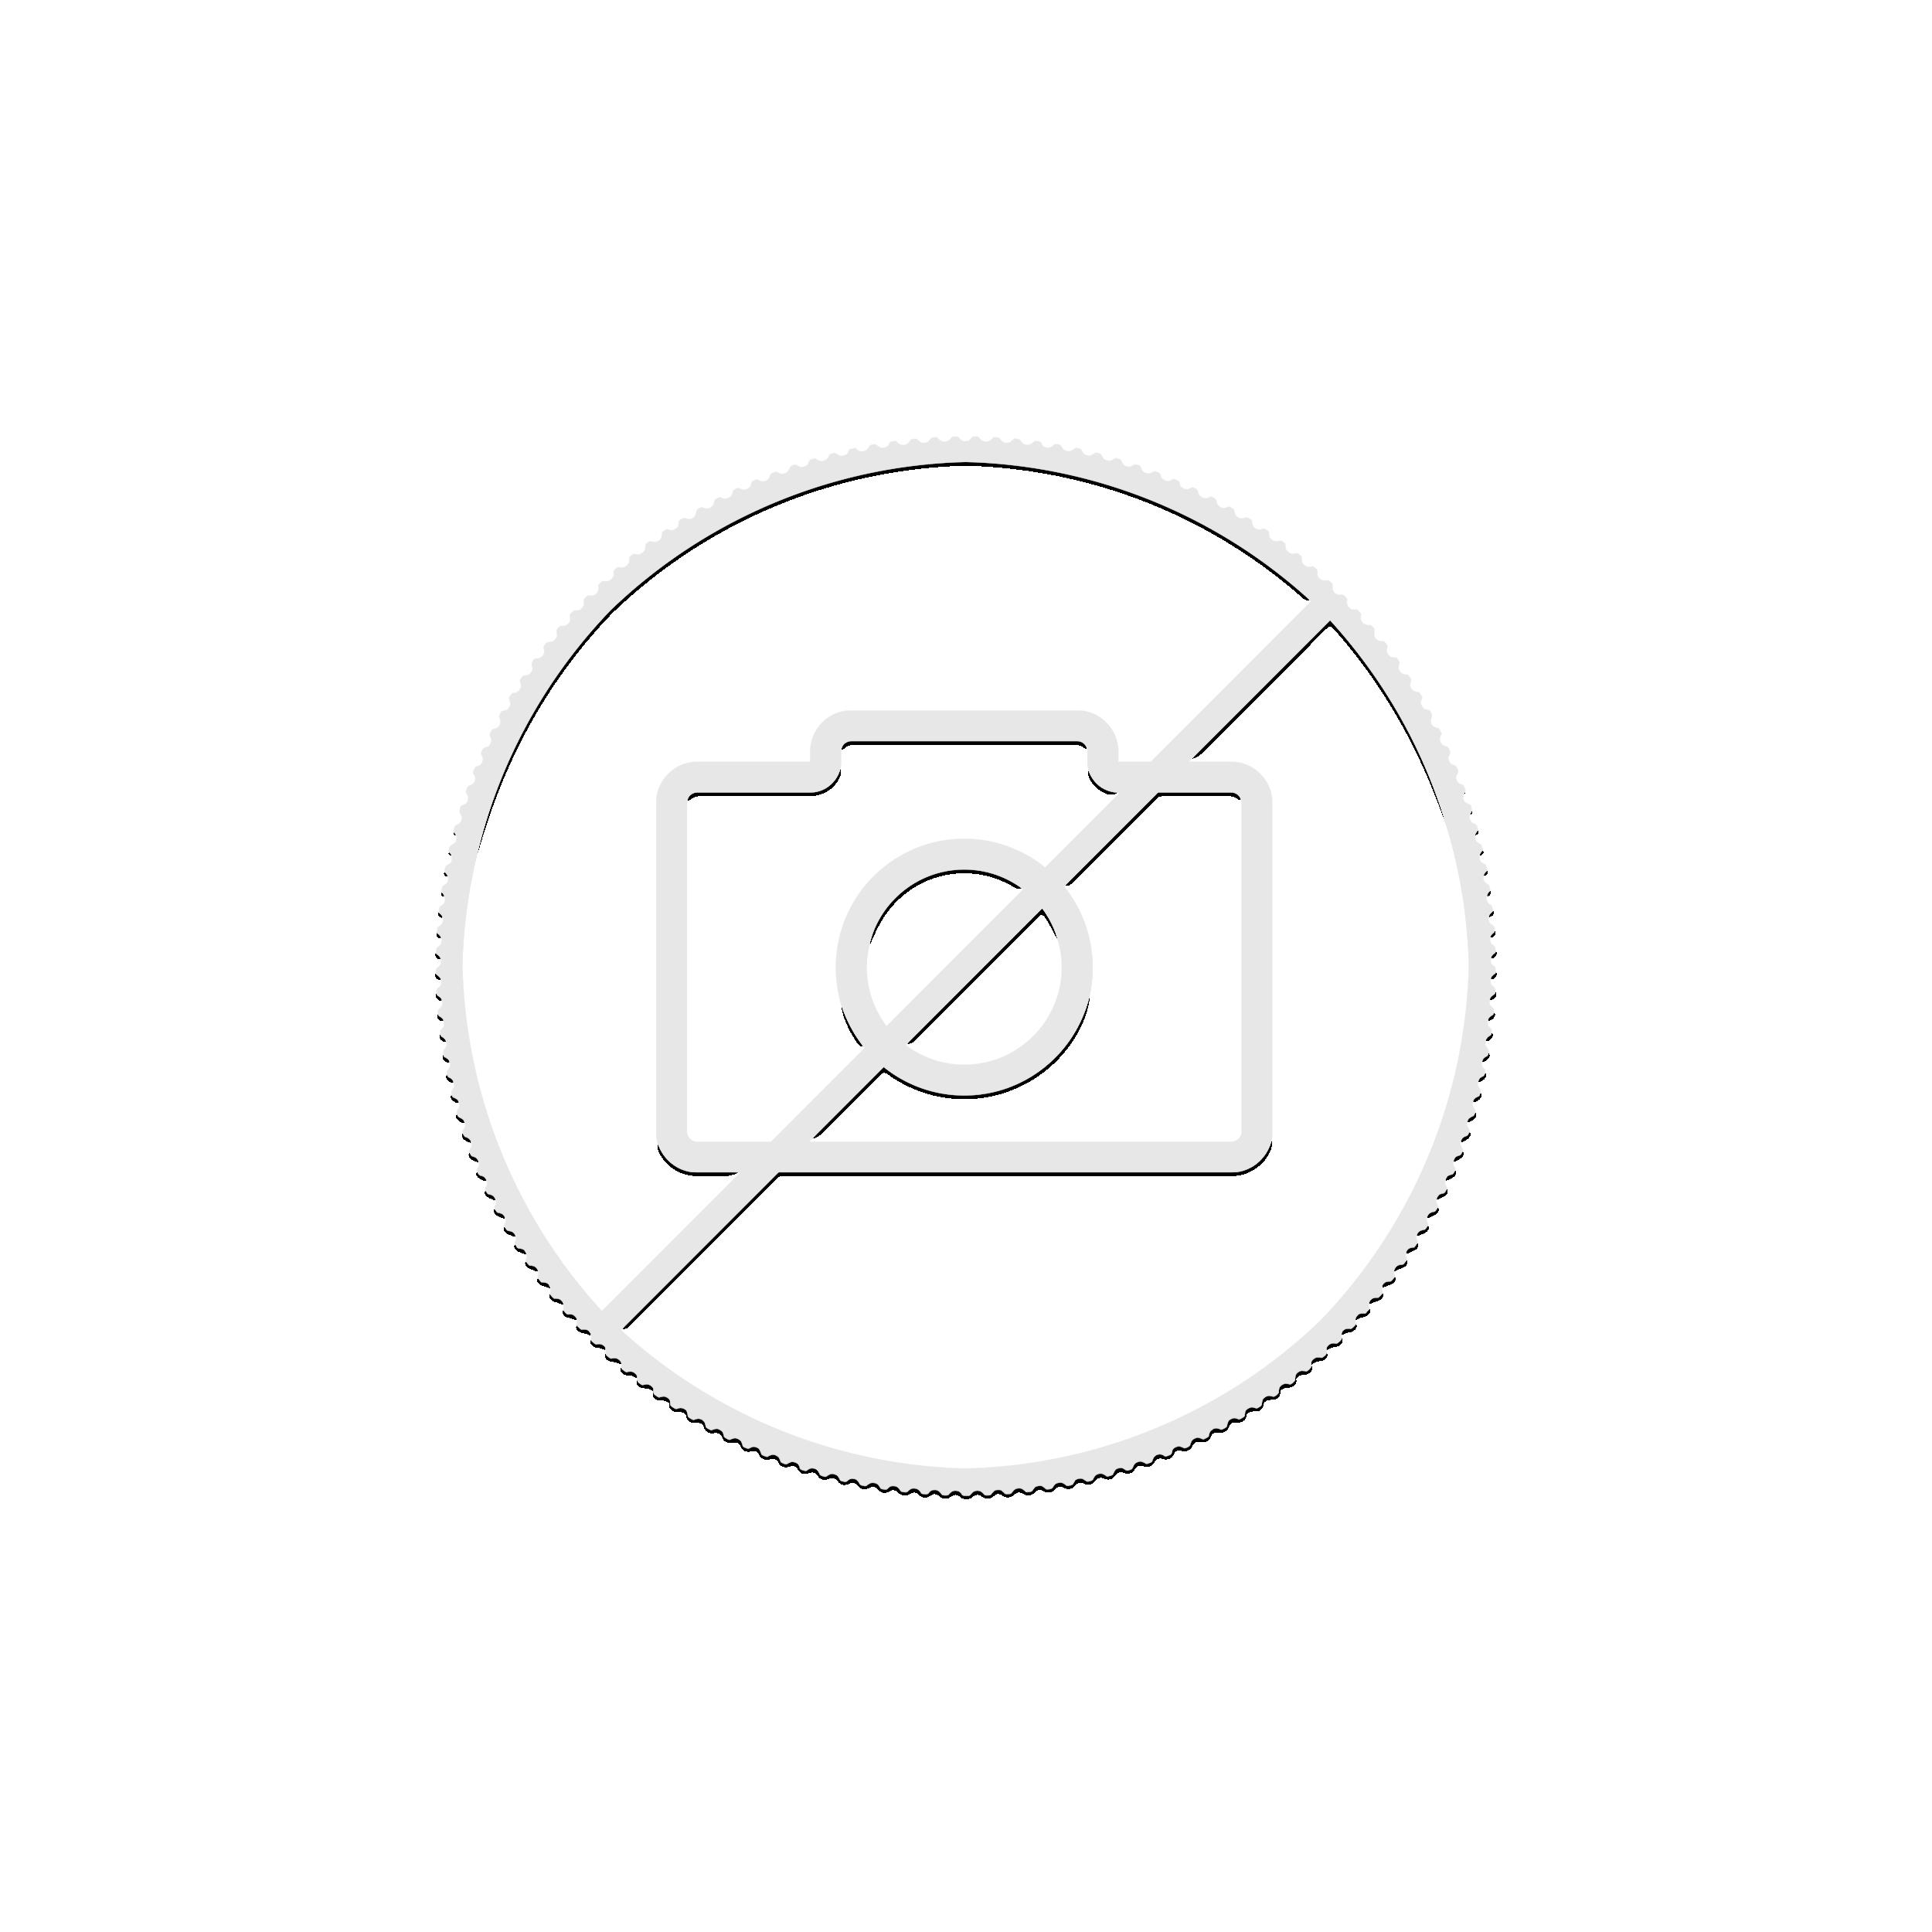 1 troy ounce silver Maple Leaf